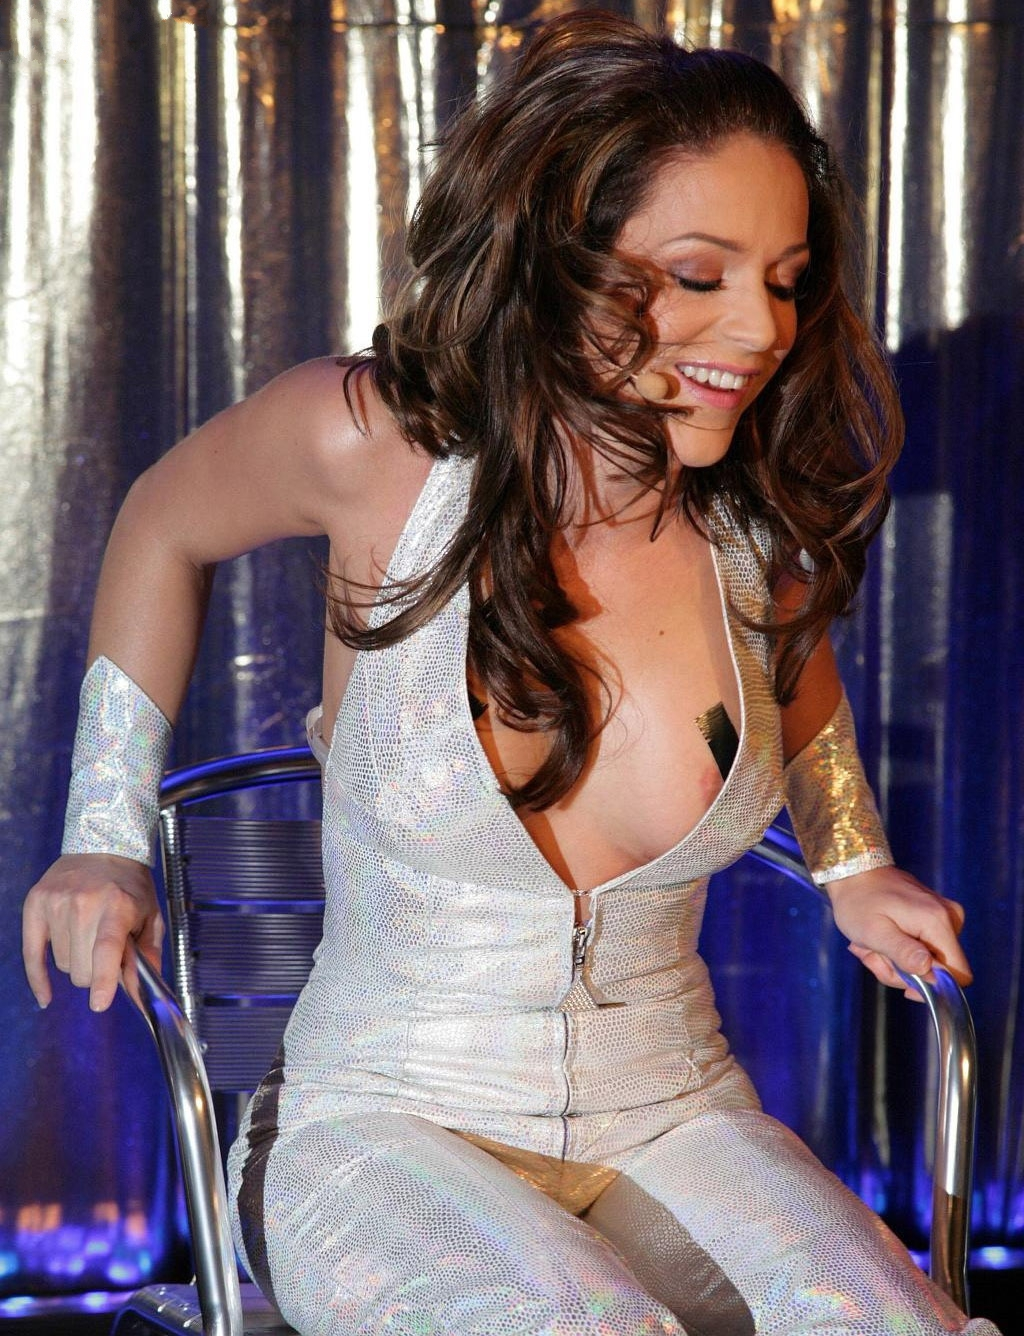 Мишель (Таня Хьюер) голая. Фото - 50